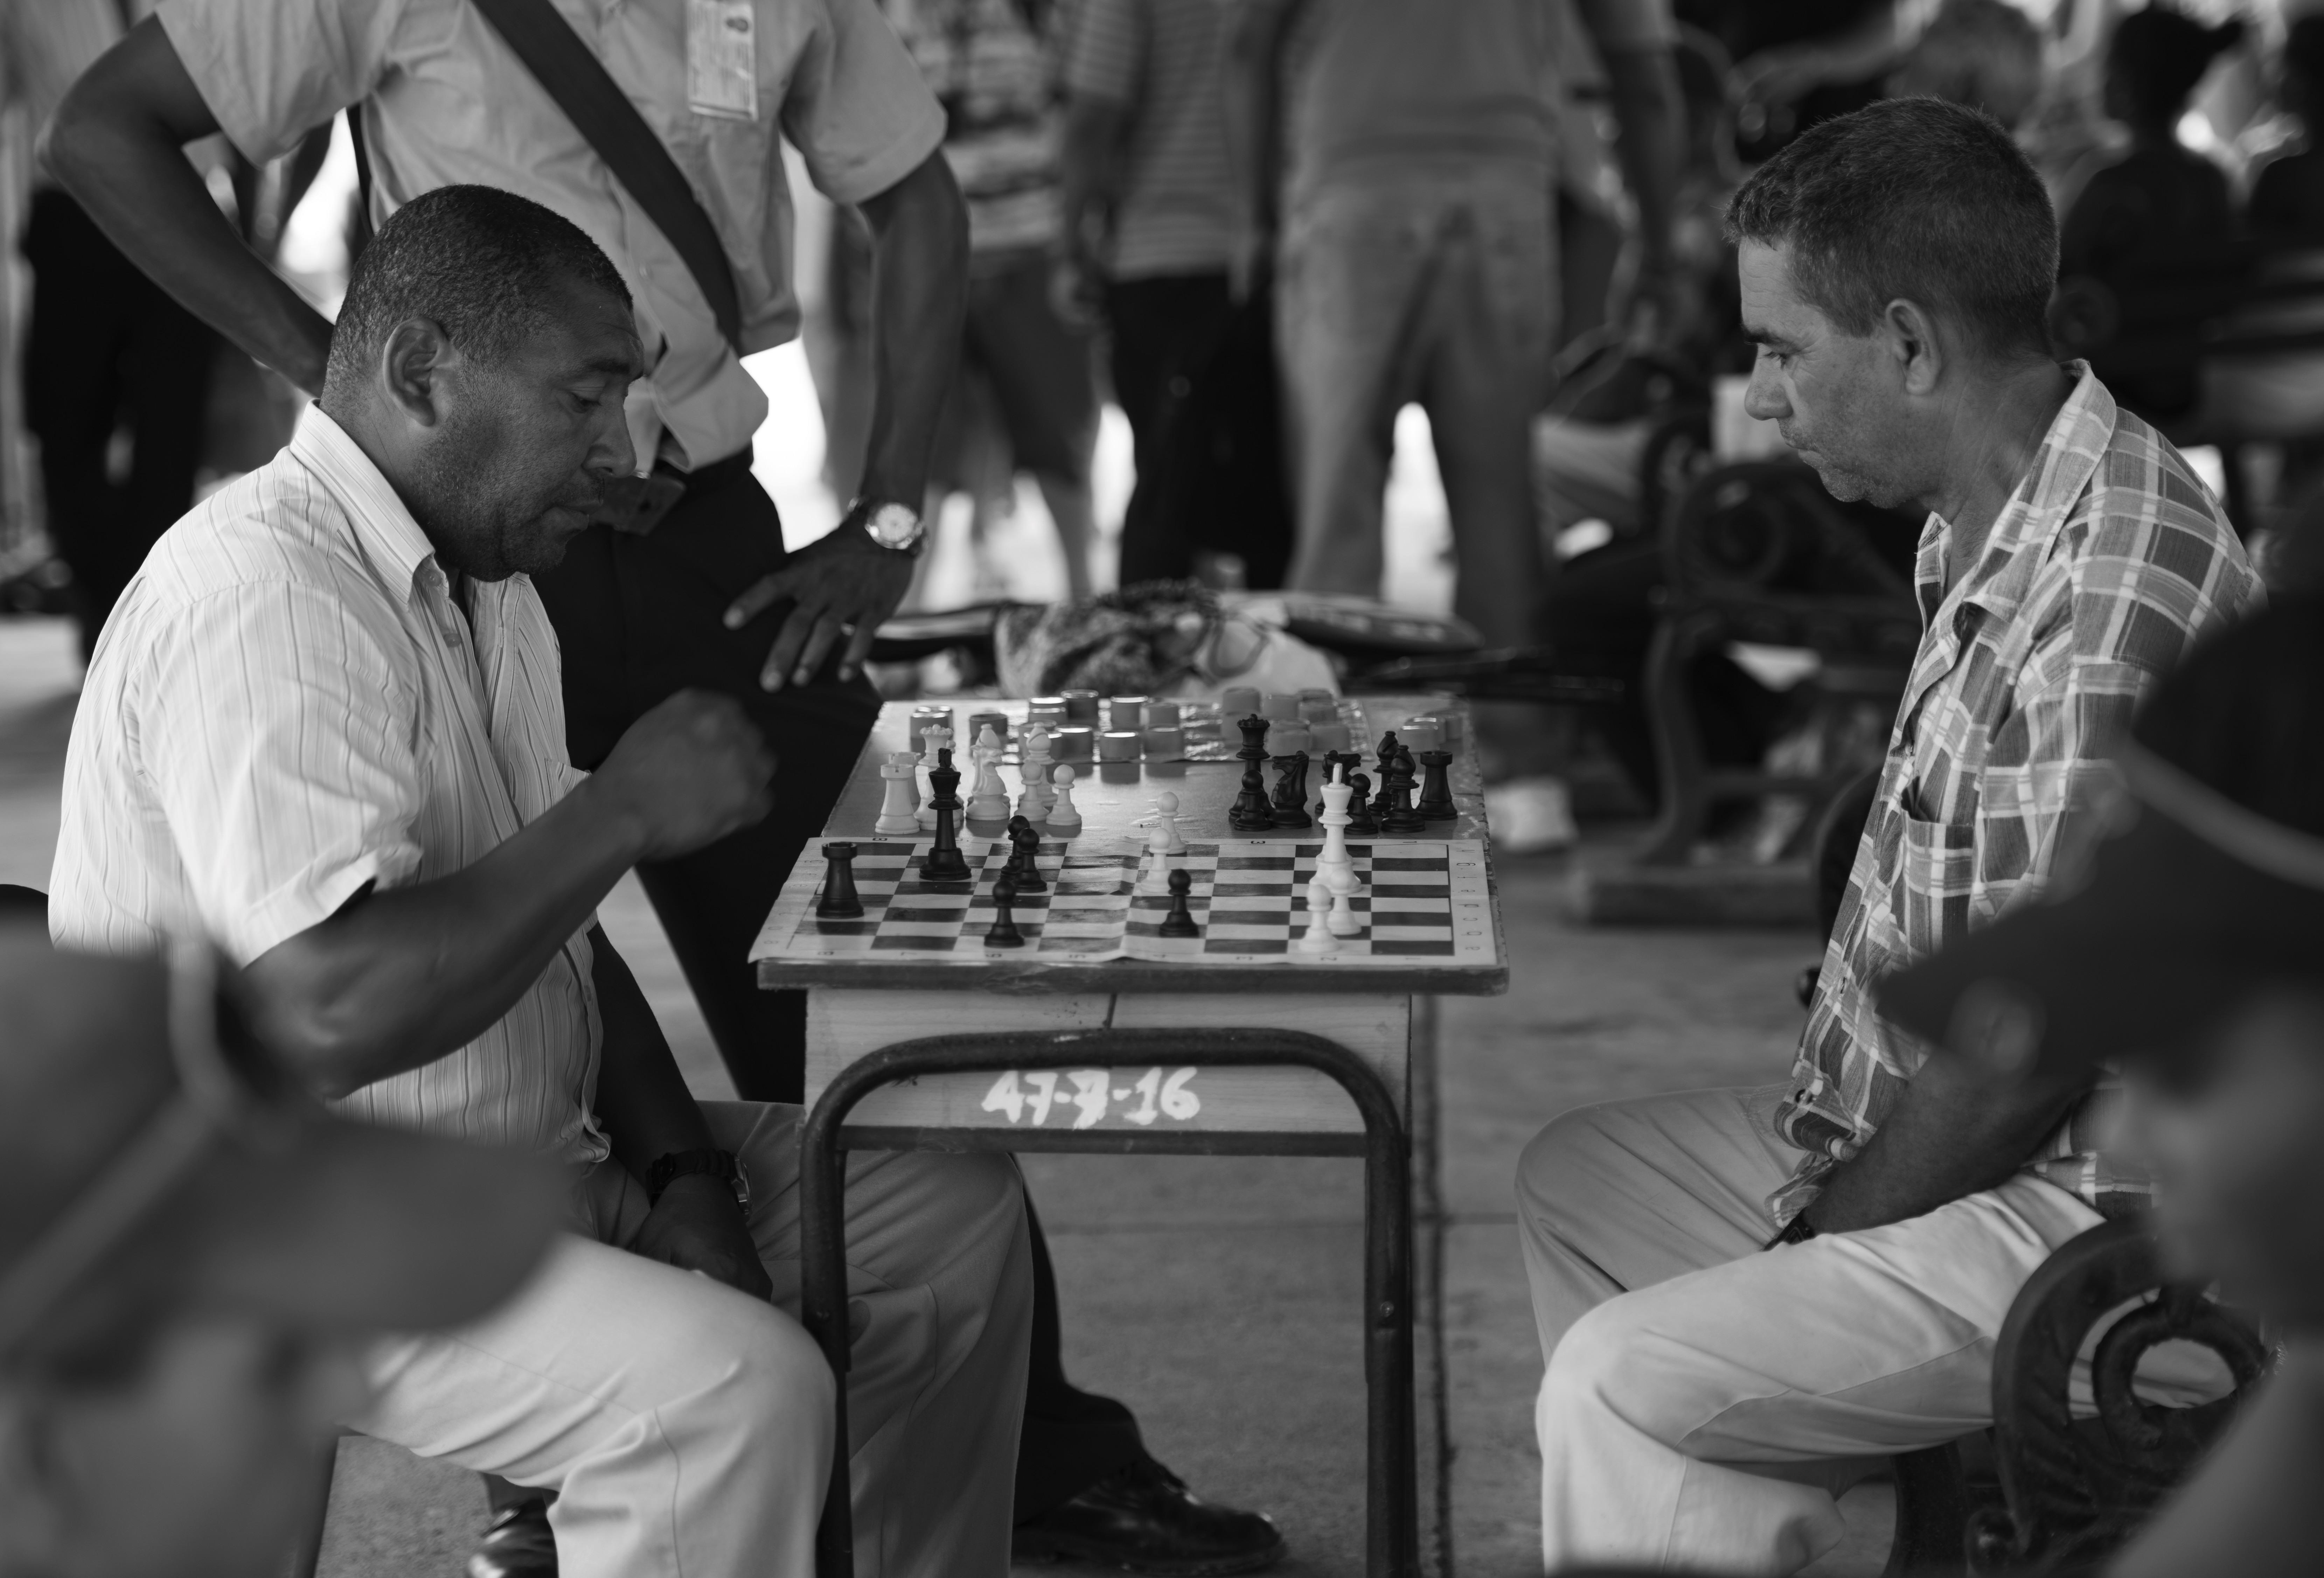 Baracoa_chess